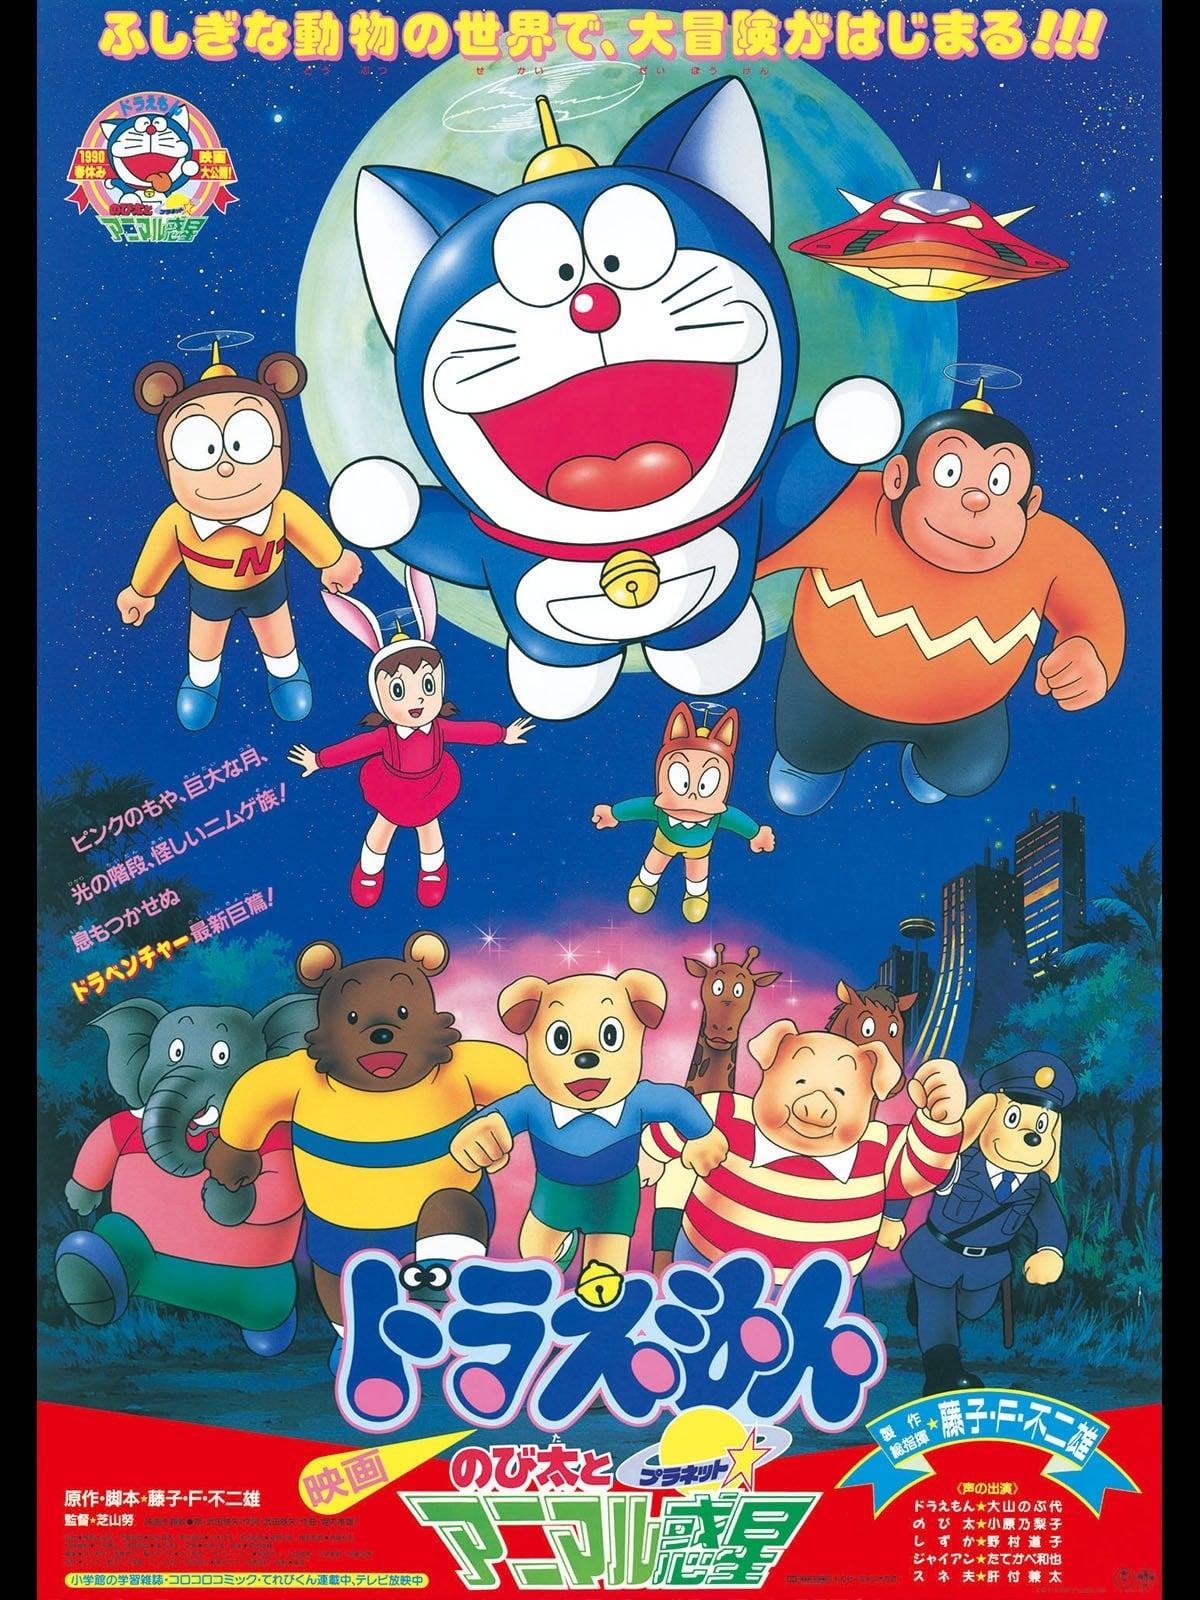 Doraemon: Nobita and the Animal Planet (1990)